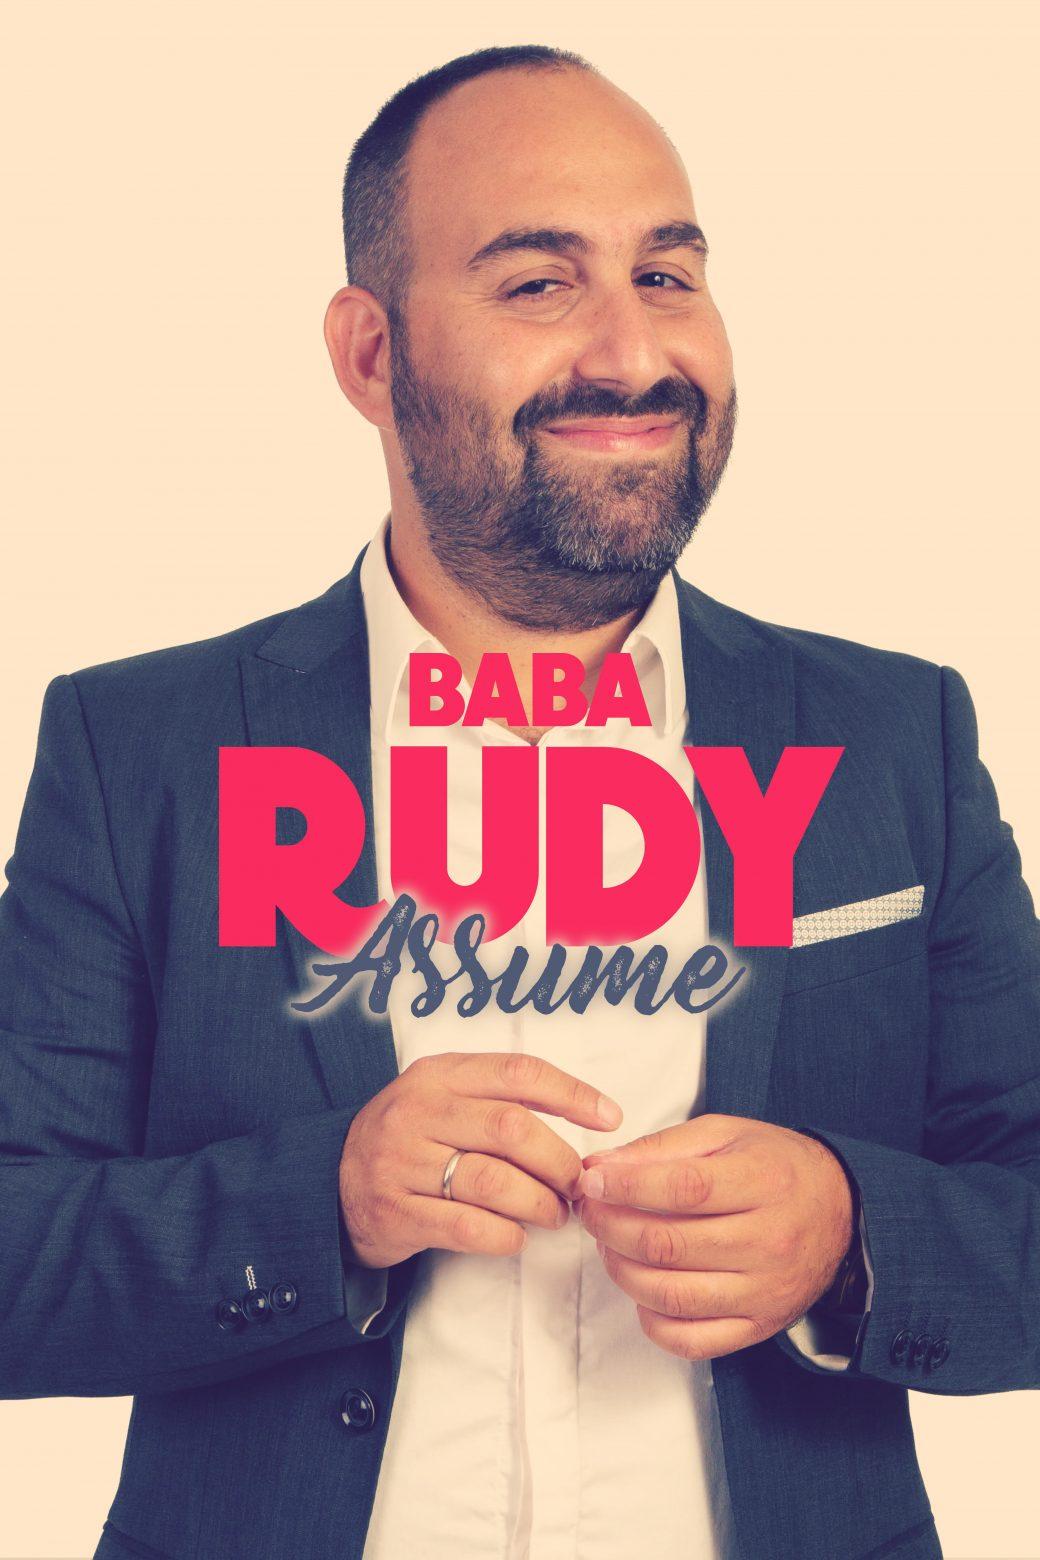 Baba RUDY Assume